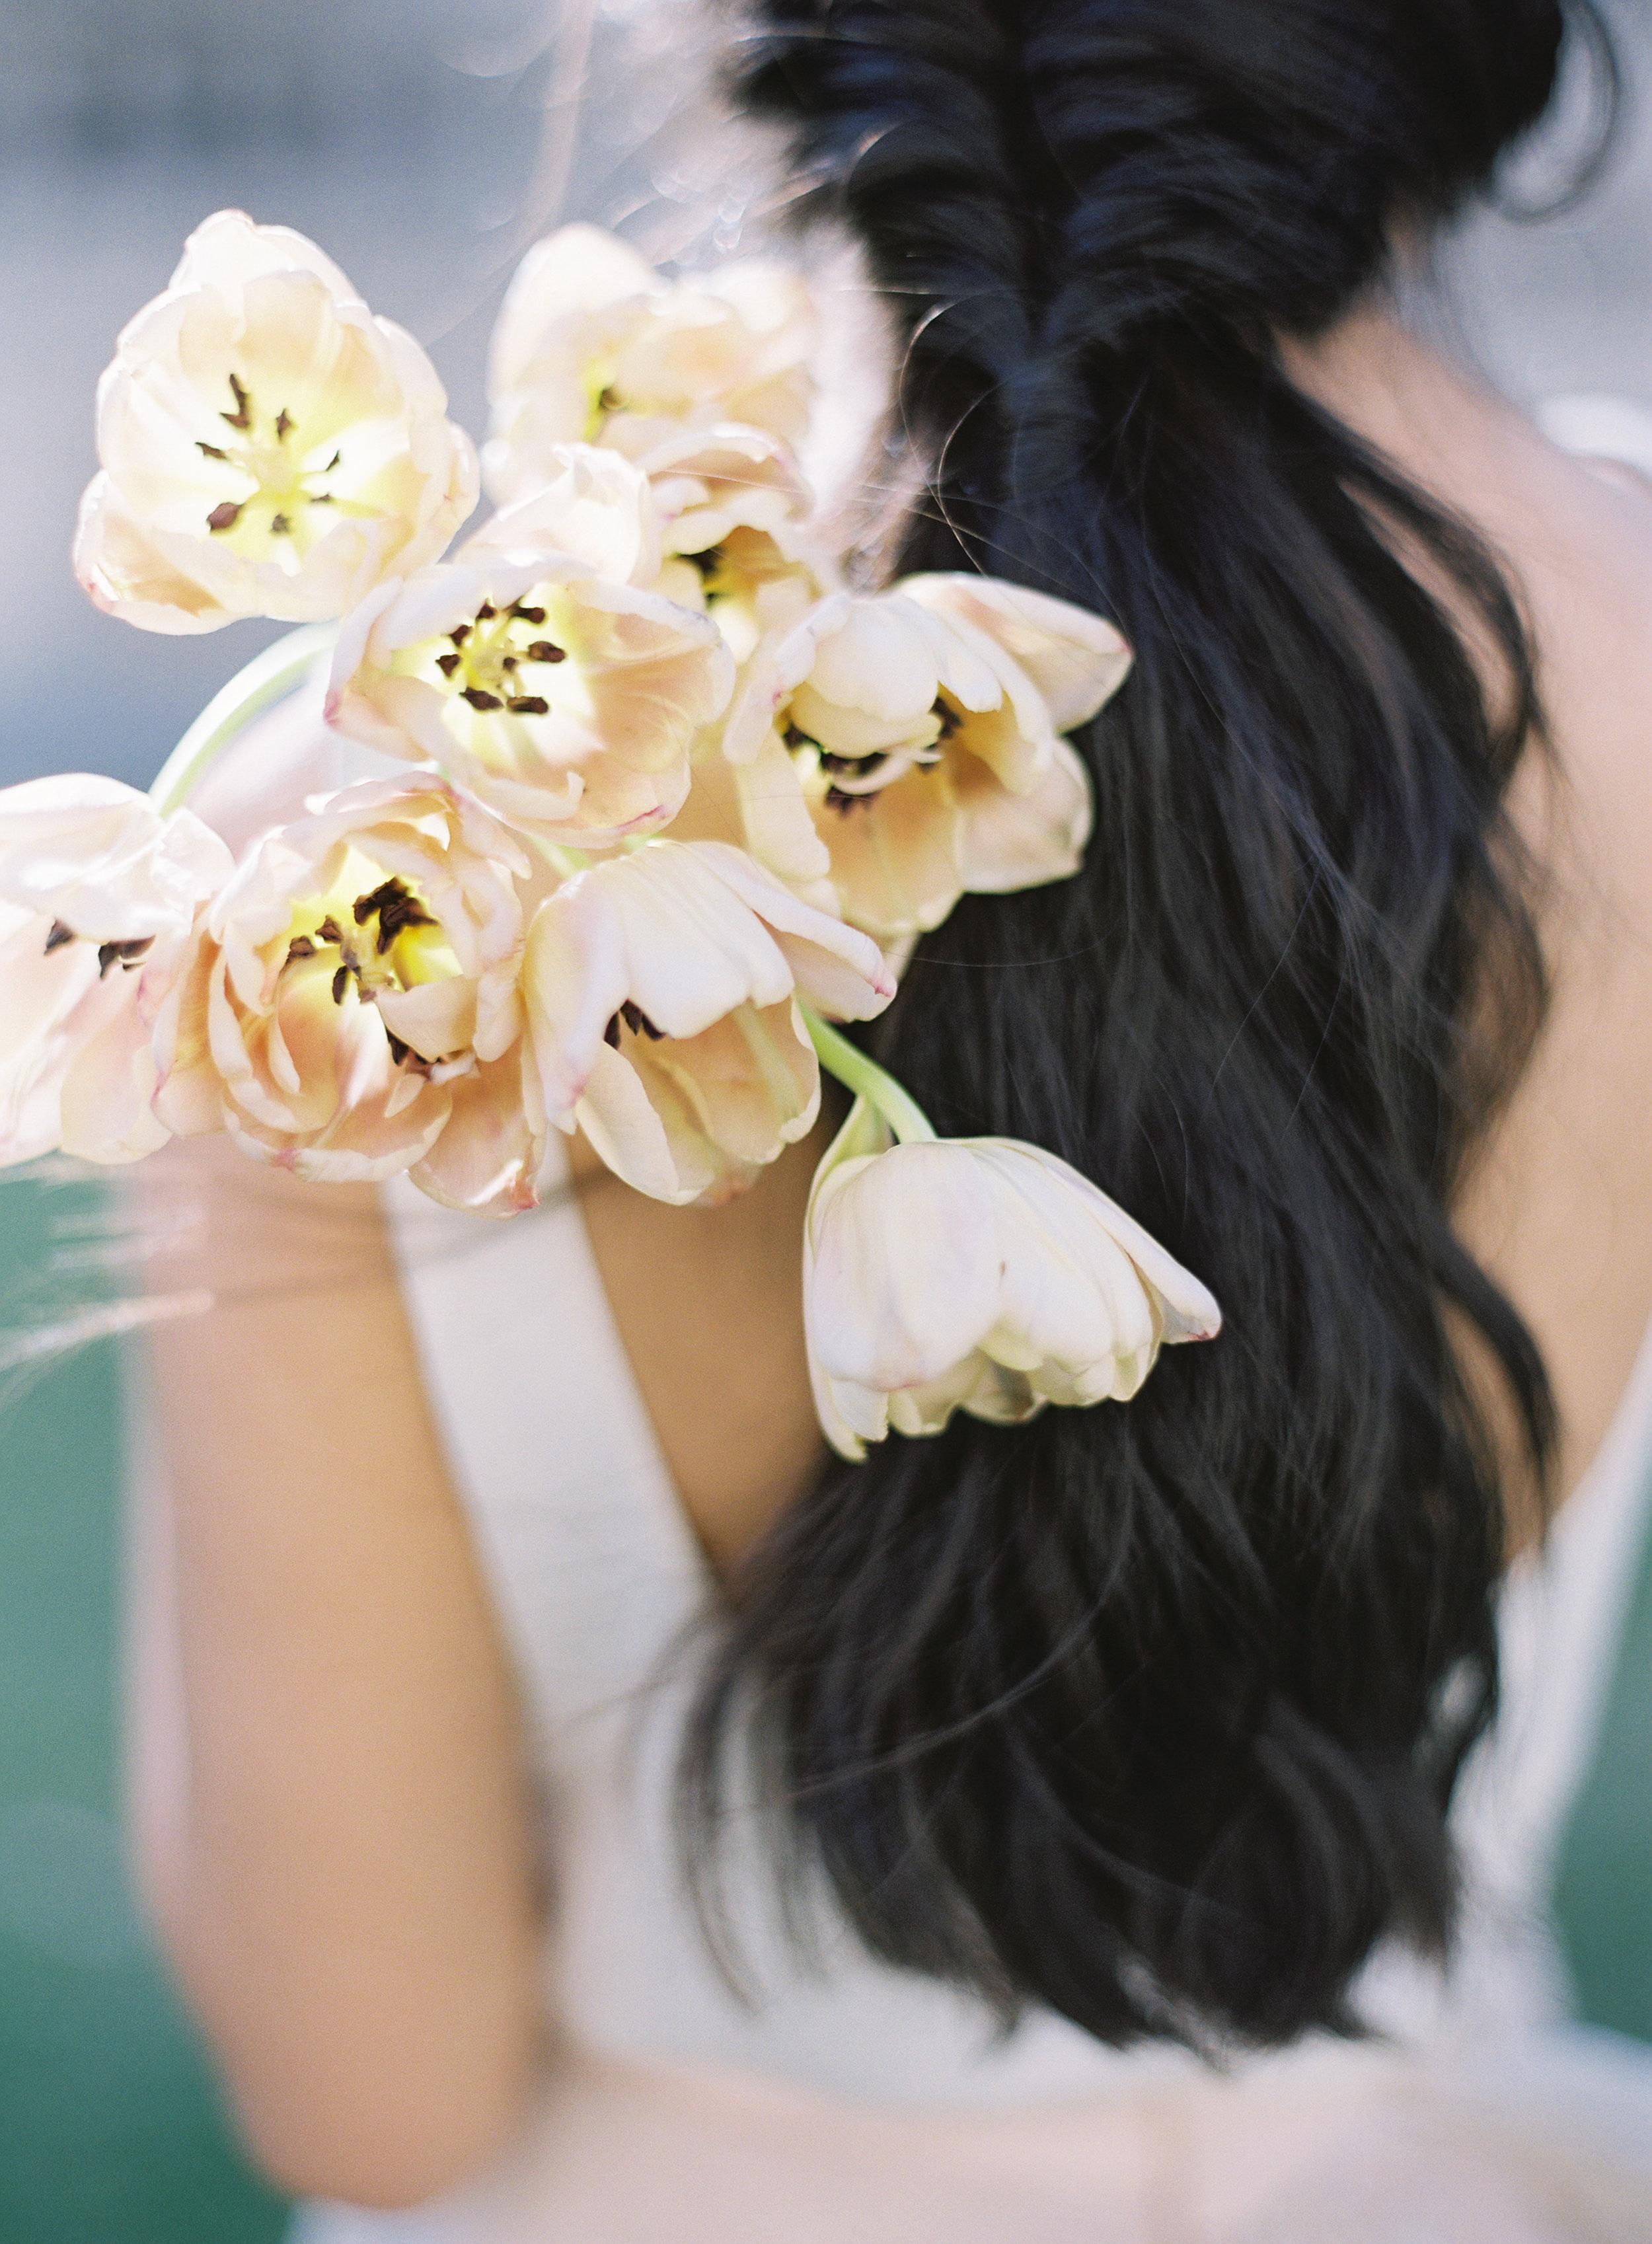 California Wedding Inspiration Fine Art Flowers Modern Romantic Finding Flora florist Sara Weir Wedding Venues Organic Bridal Bouquet Sarah Seven Luxury Magnolia Rouge Tulips